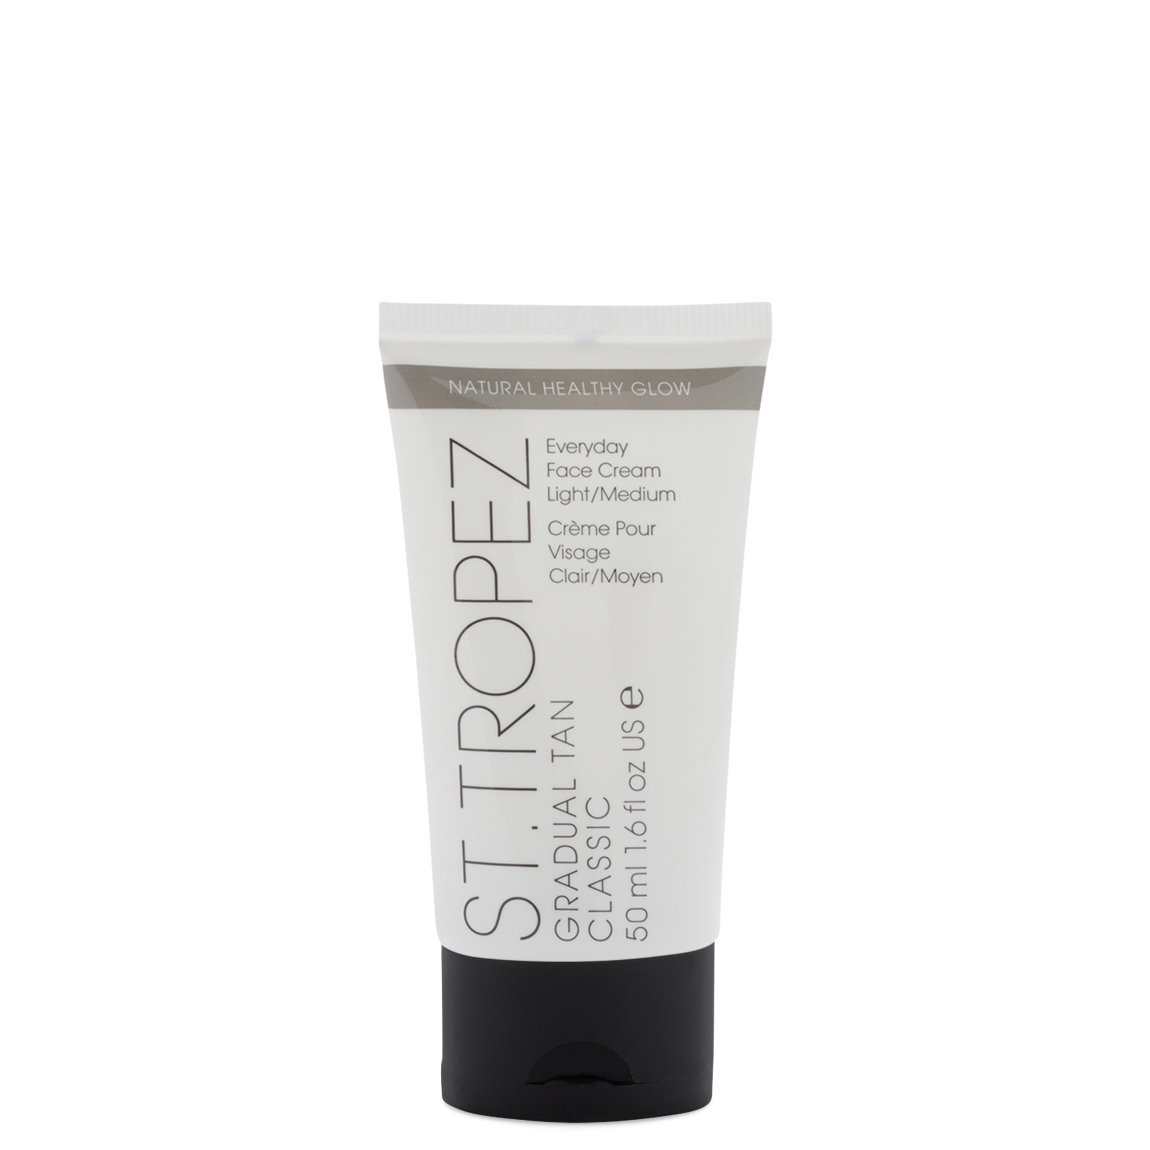 St. Tropez Gradual Tan Classic Face Cream Light/Medium alternative view 1 - product swatch.